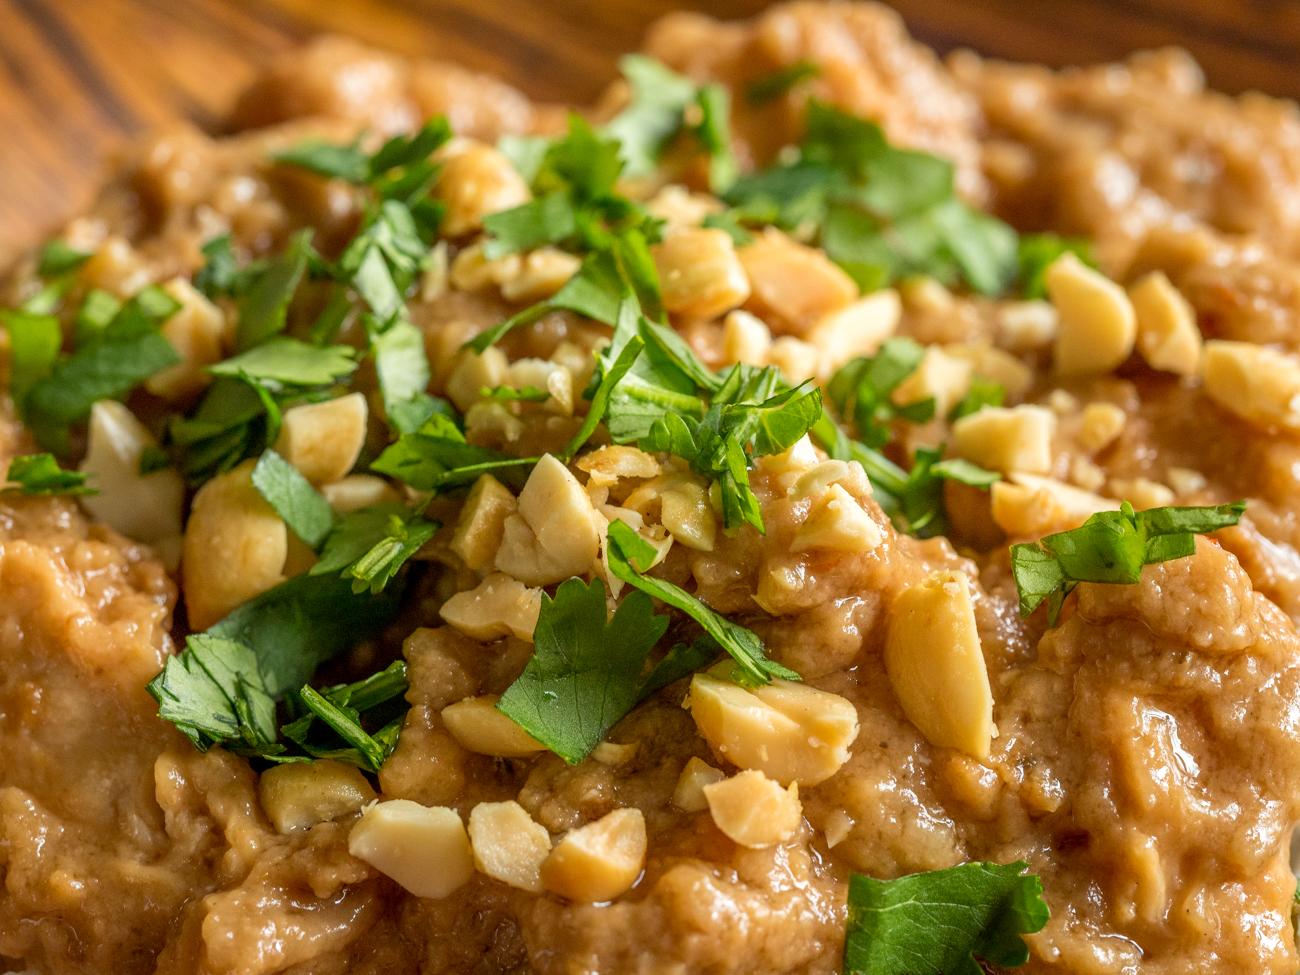 Slow Cooker Thai Peanut Chicken Horizontal 2